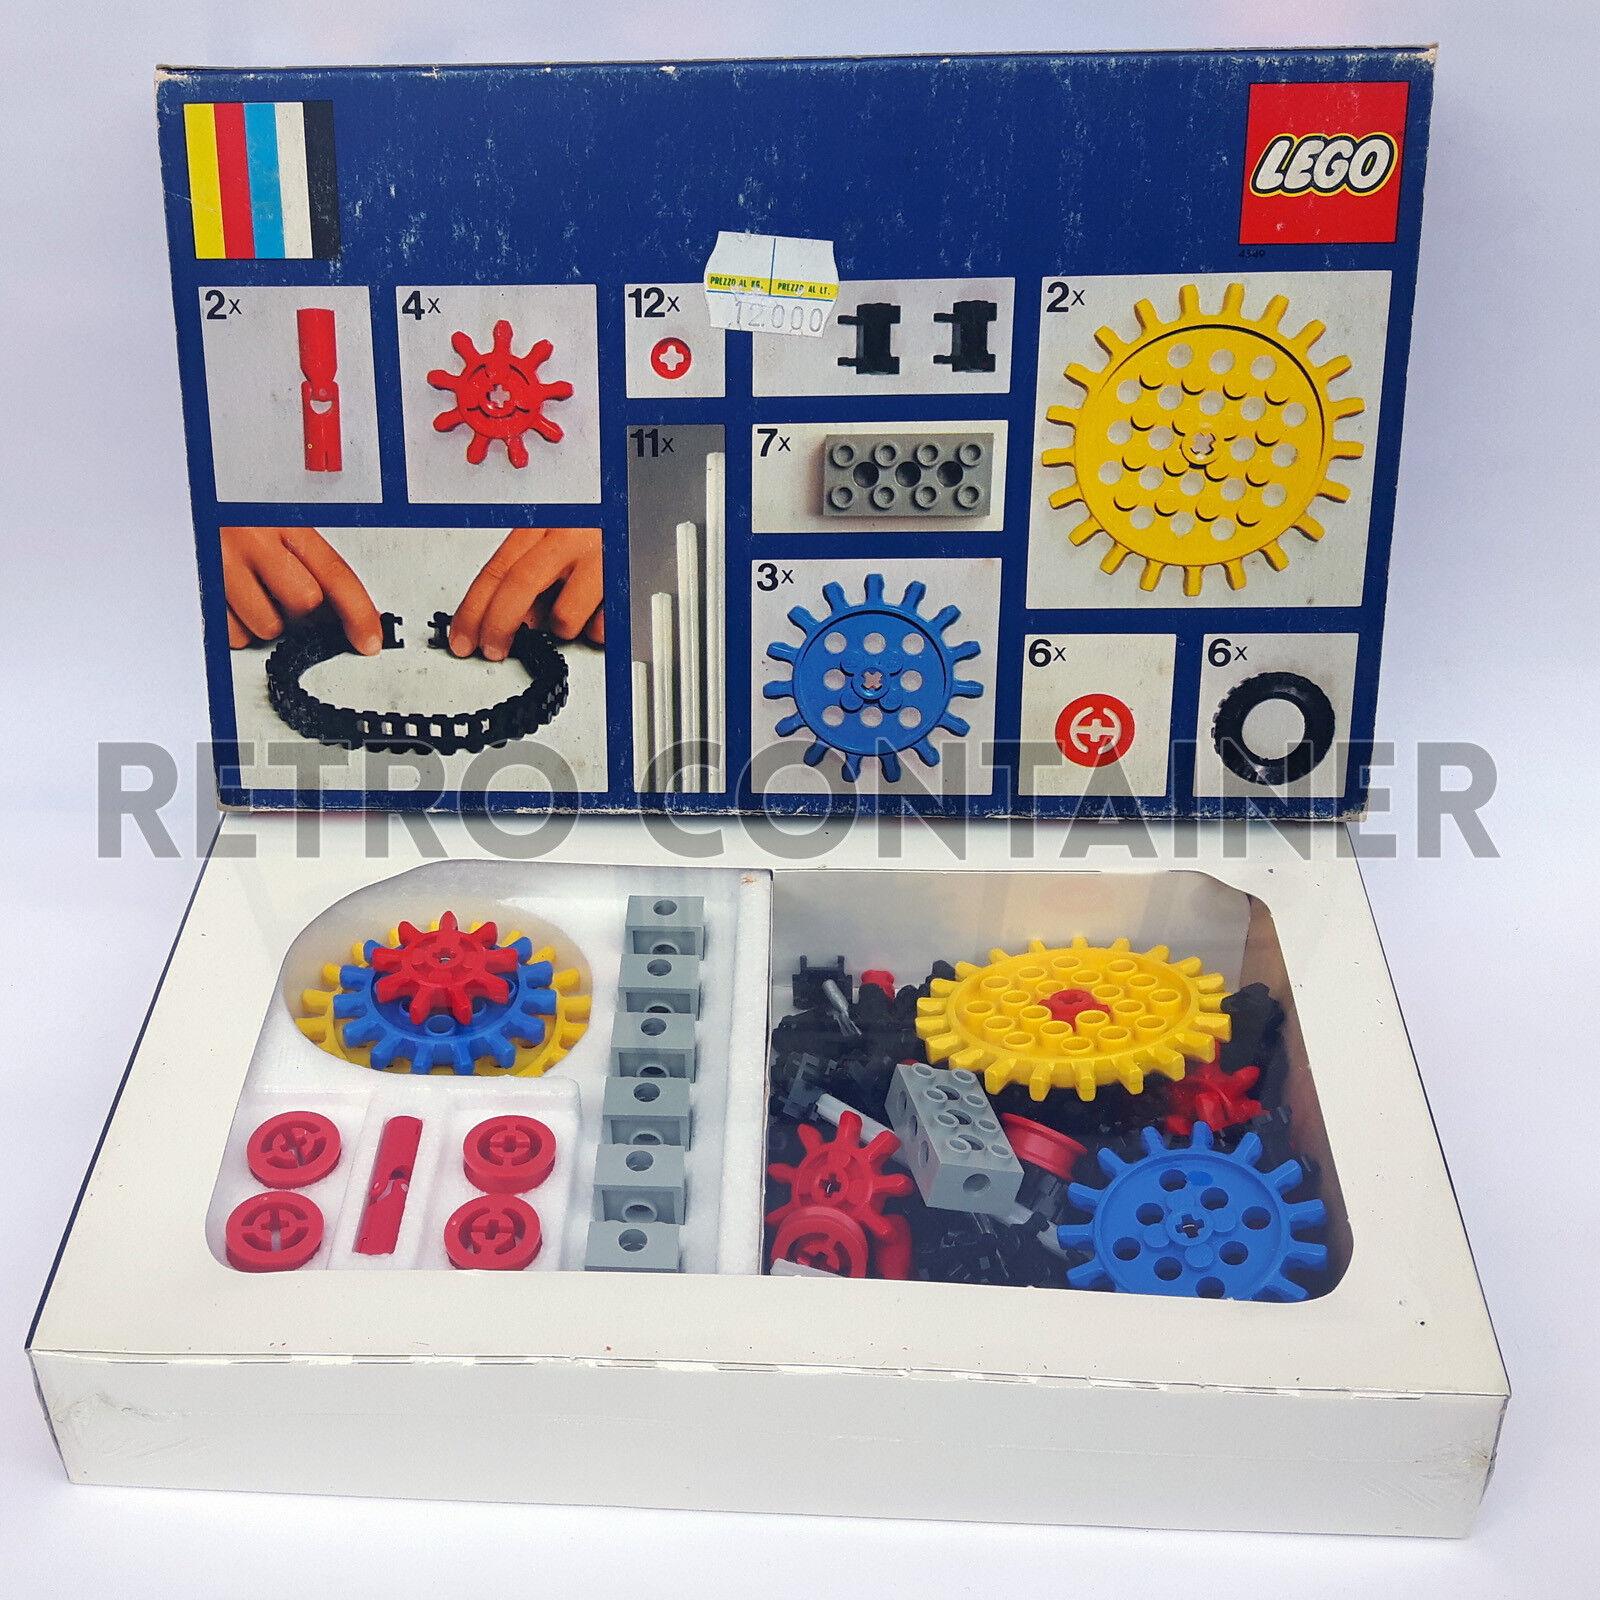 LEGO NEW Set MISB Sigillato 812 - Supplementary Gear Set 1974 Universal Building